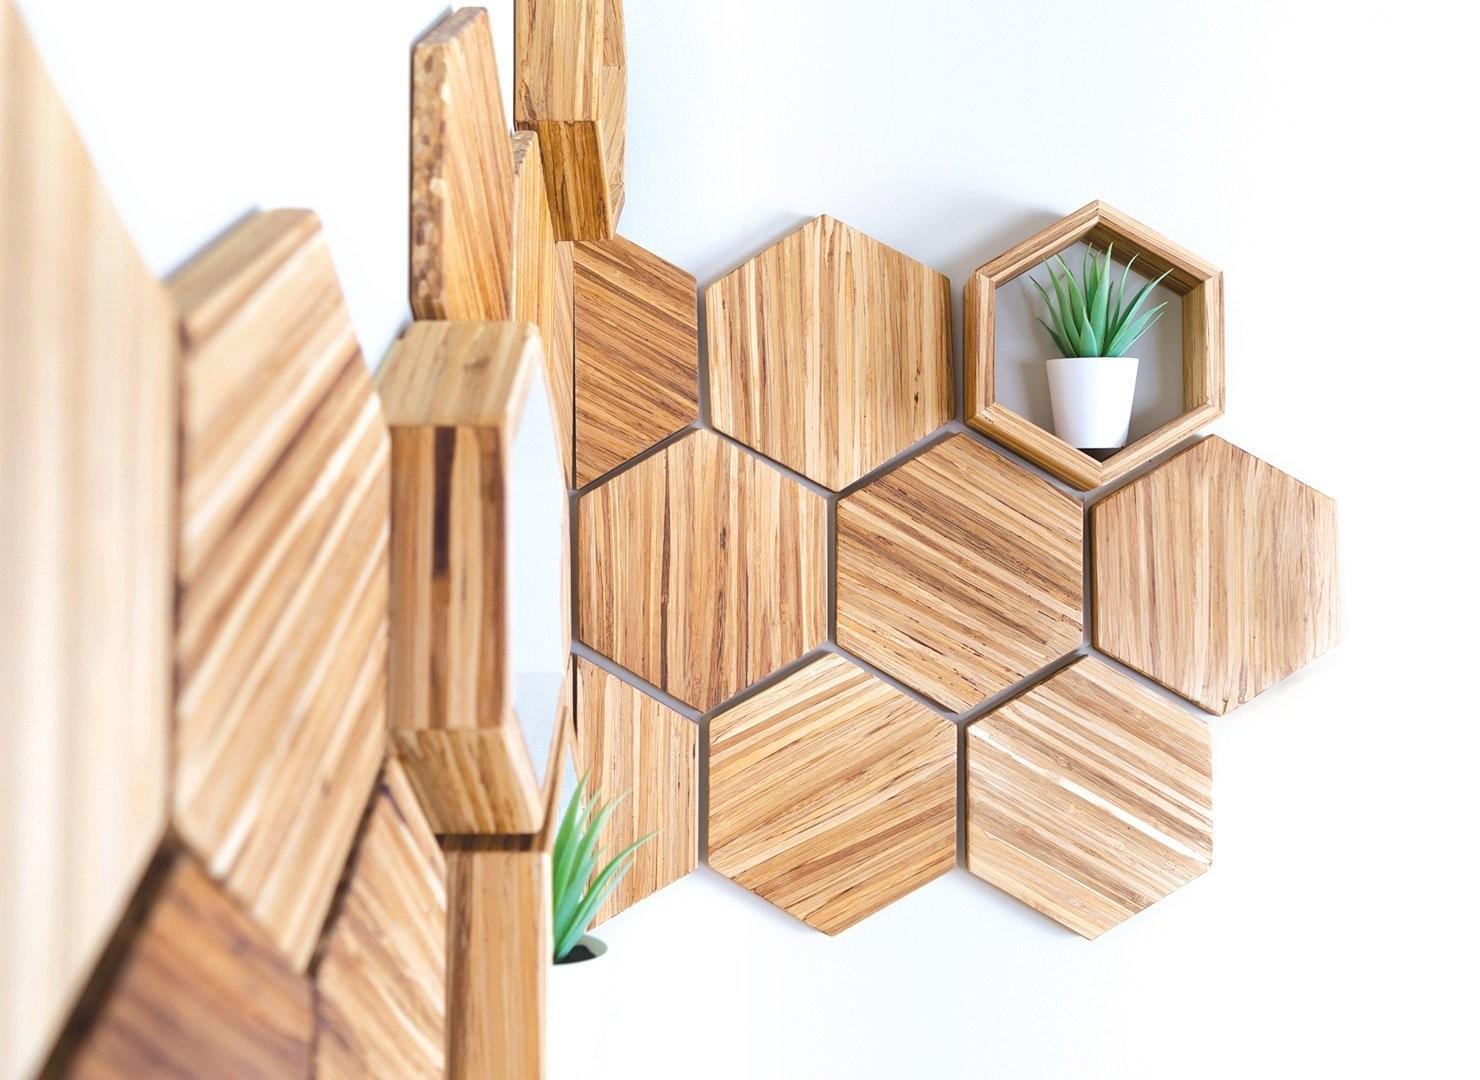 a picture of an hexagonal shelving unit